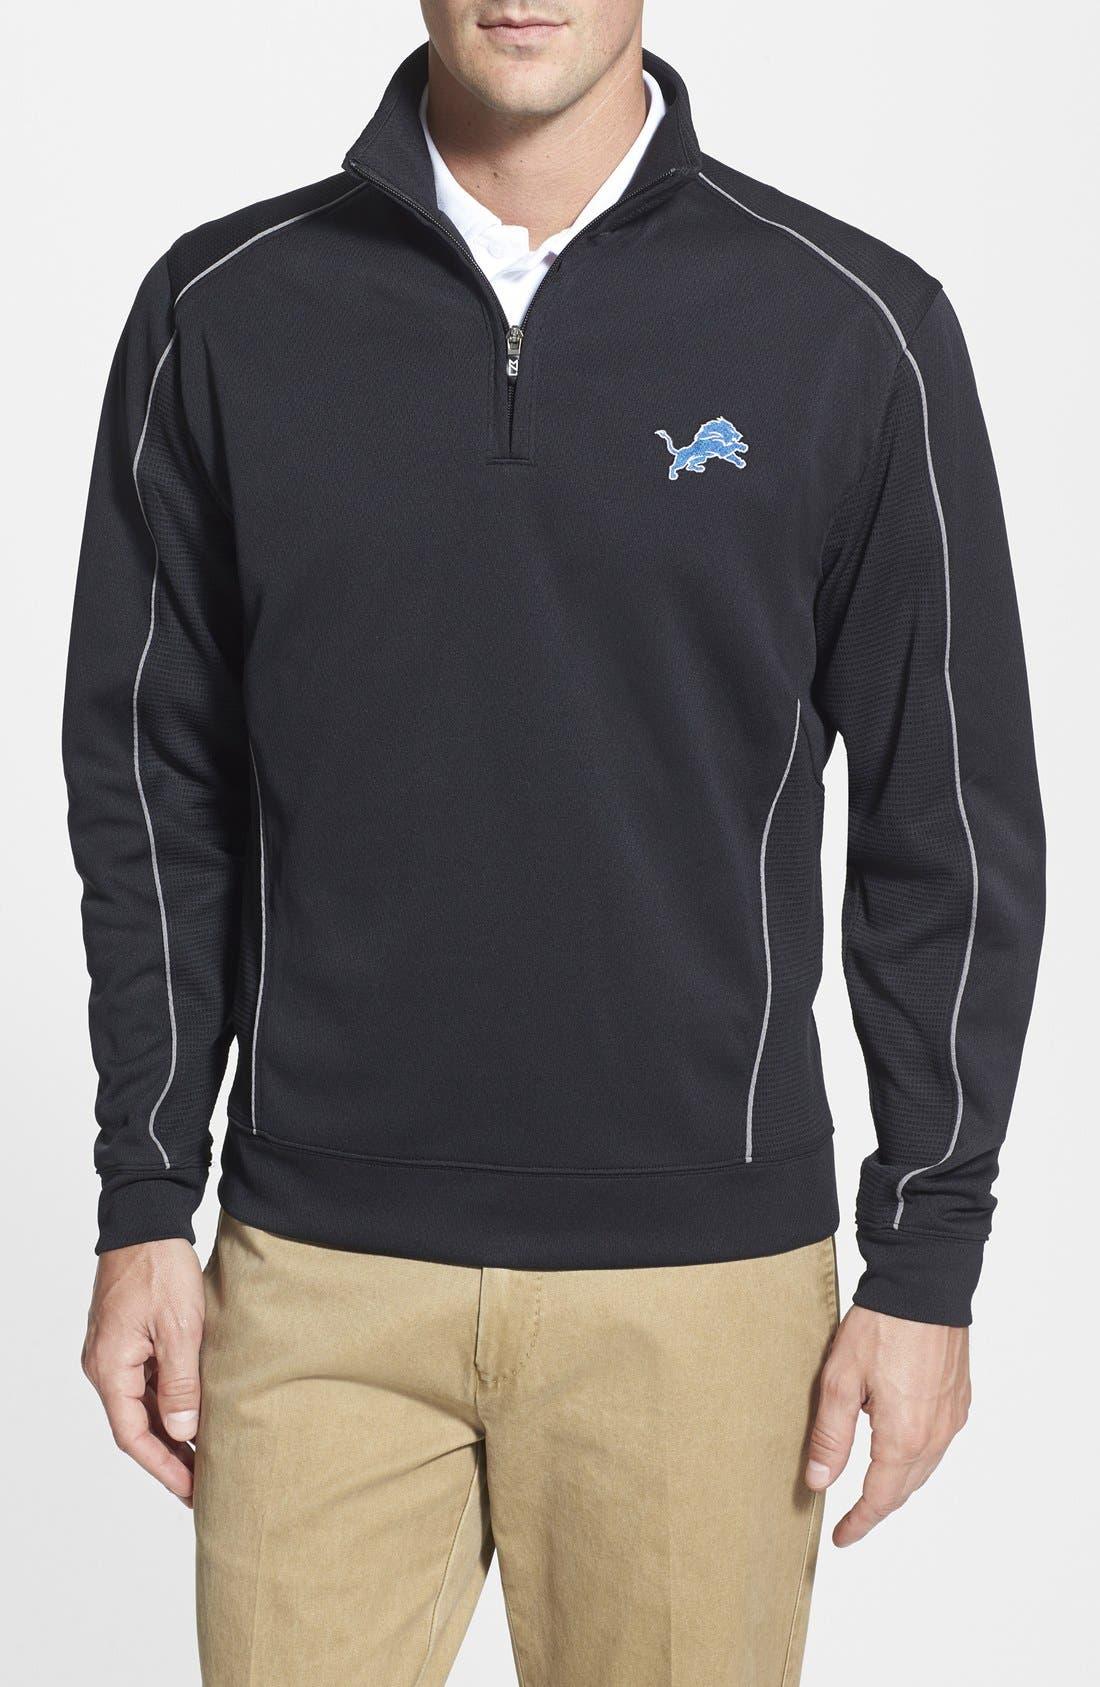 Detroit Lions - Edge DryTec Moisture Wicking Half Zip Pullover,                             Main thumbnail 1, color,                             001